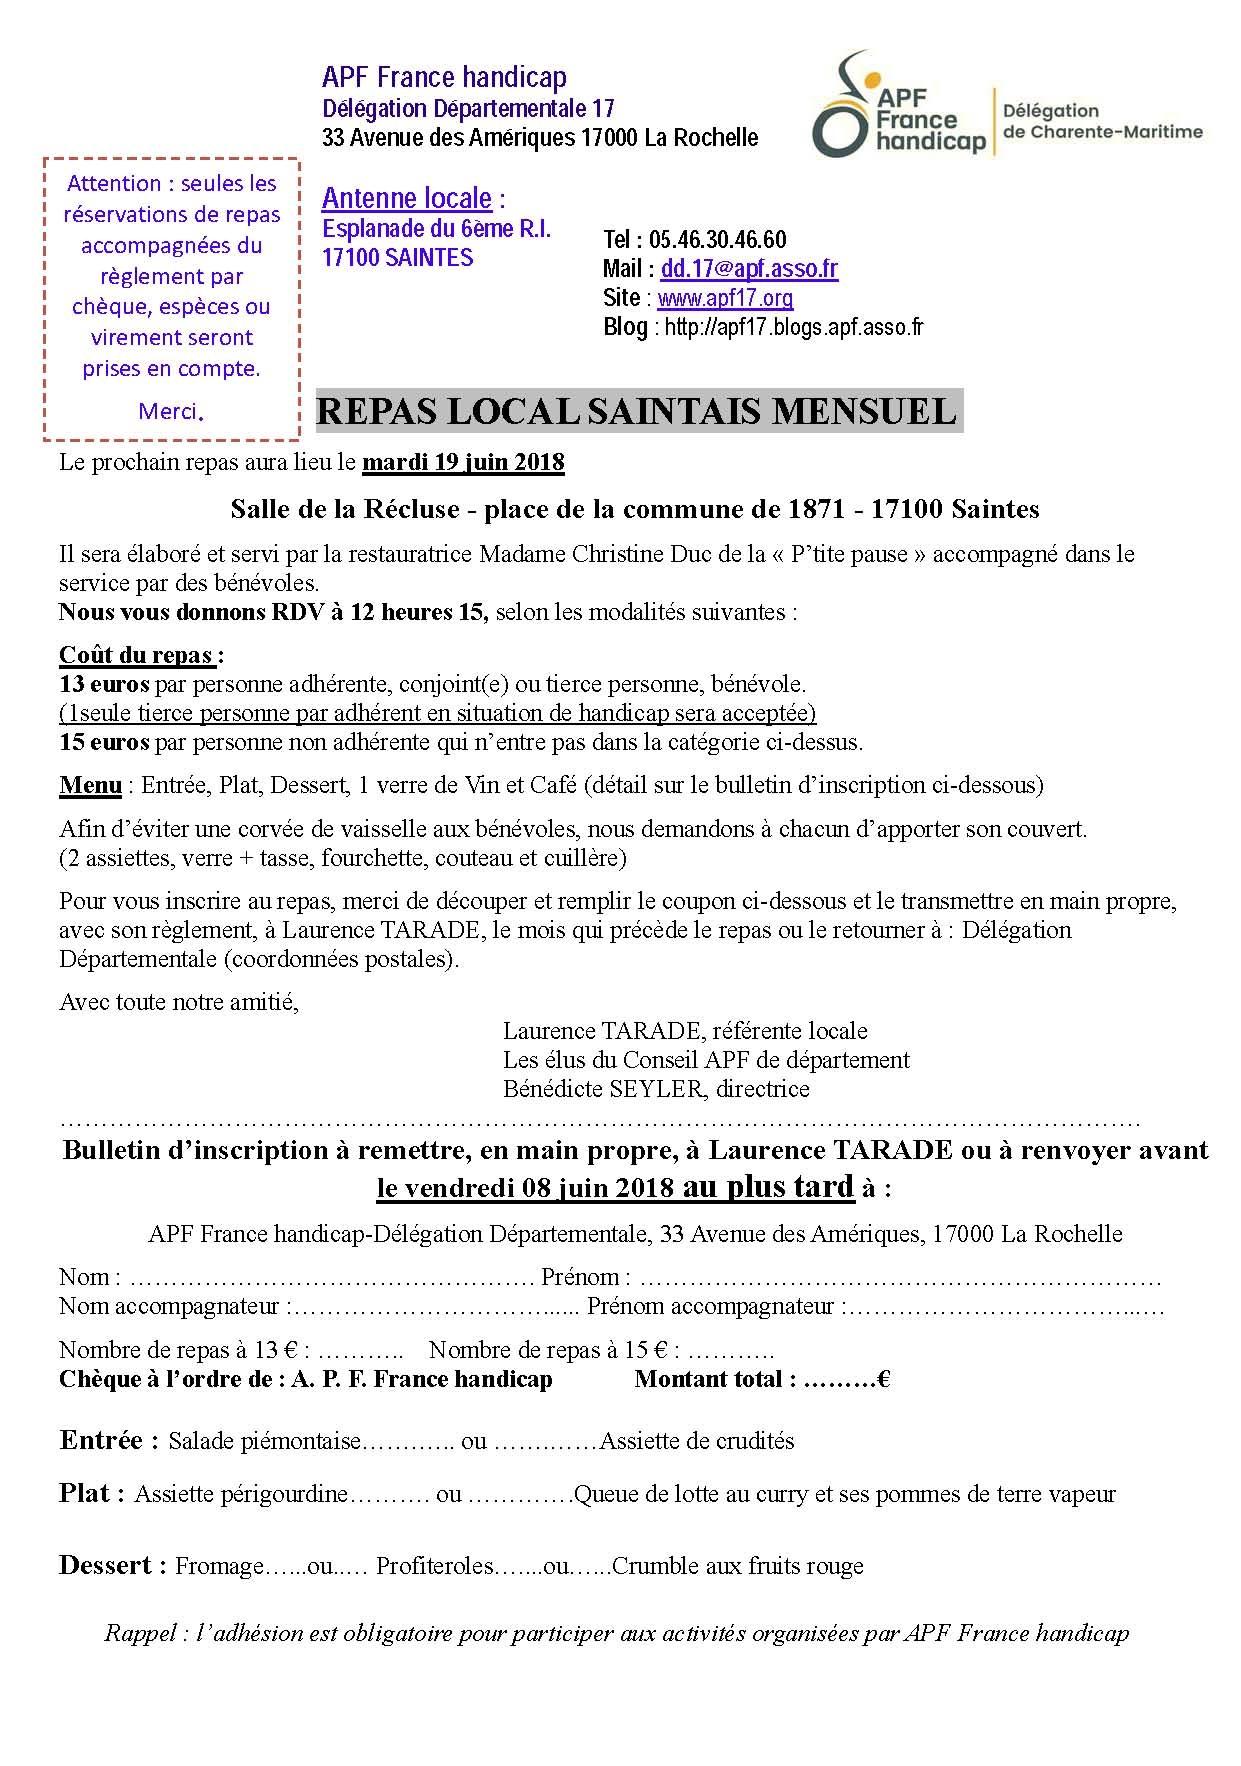 Inscription APF Repas local Saintais mensuel Juin 2018.jpg